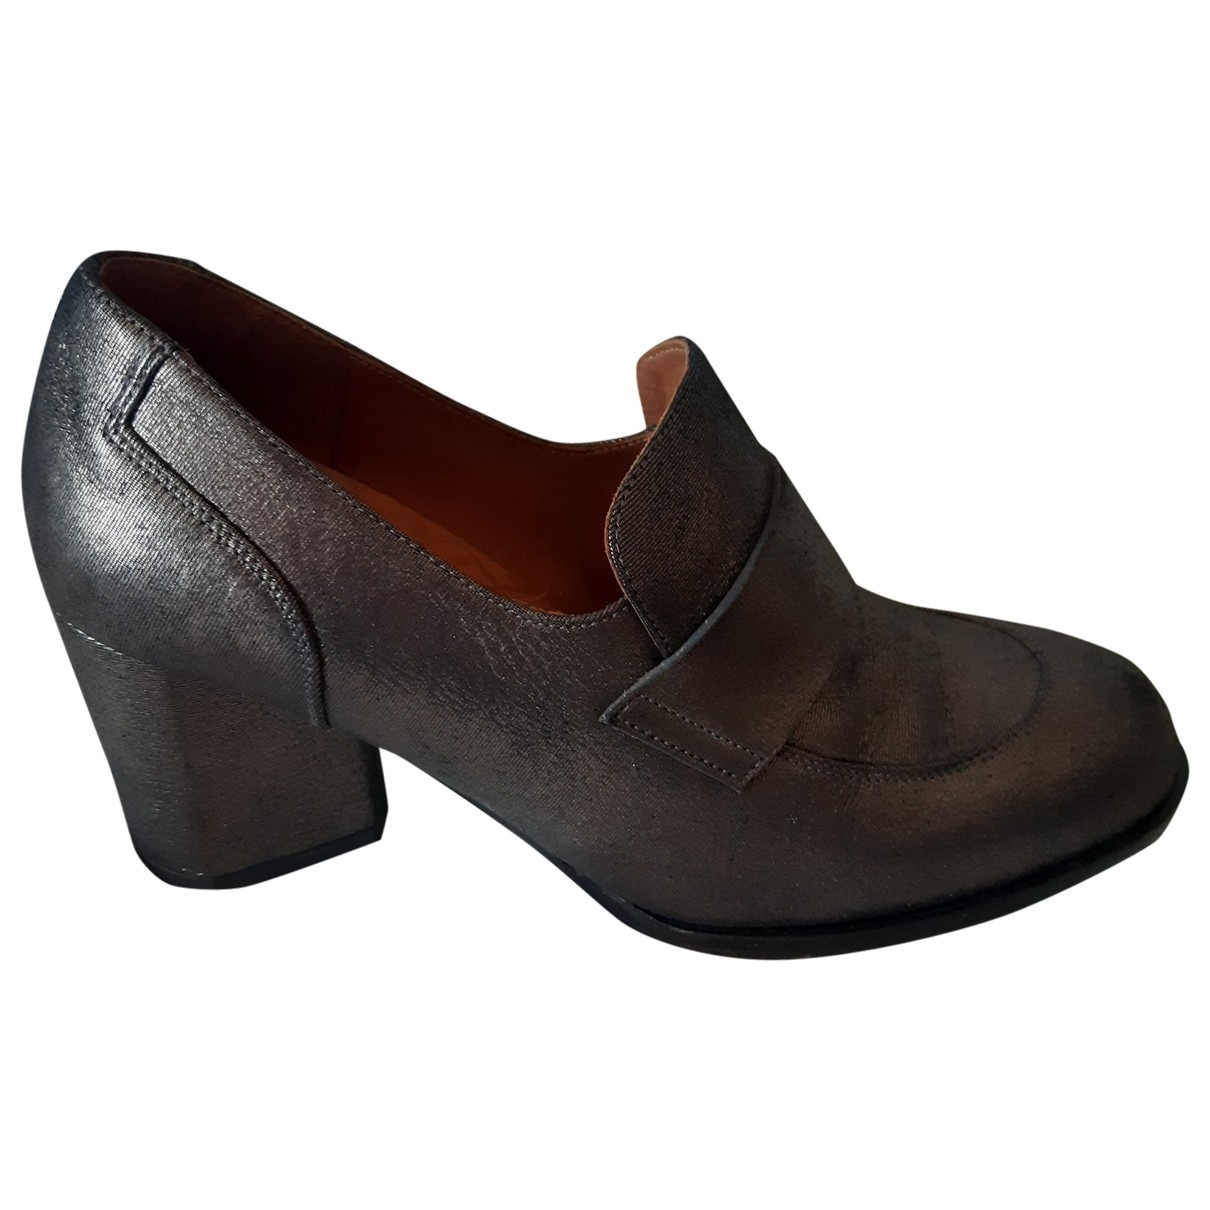 Chie Mihara \N Brown Leather Heels for Women 37 EU